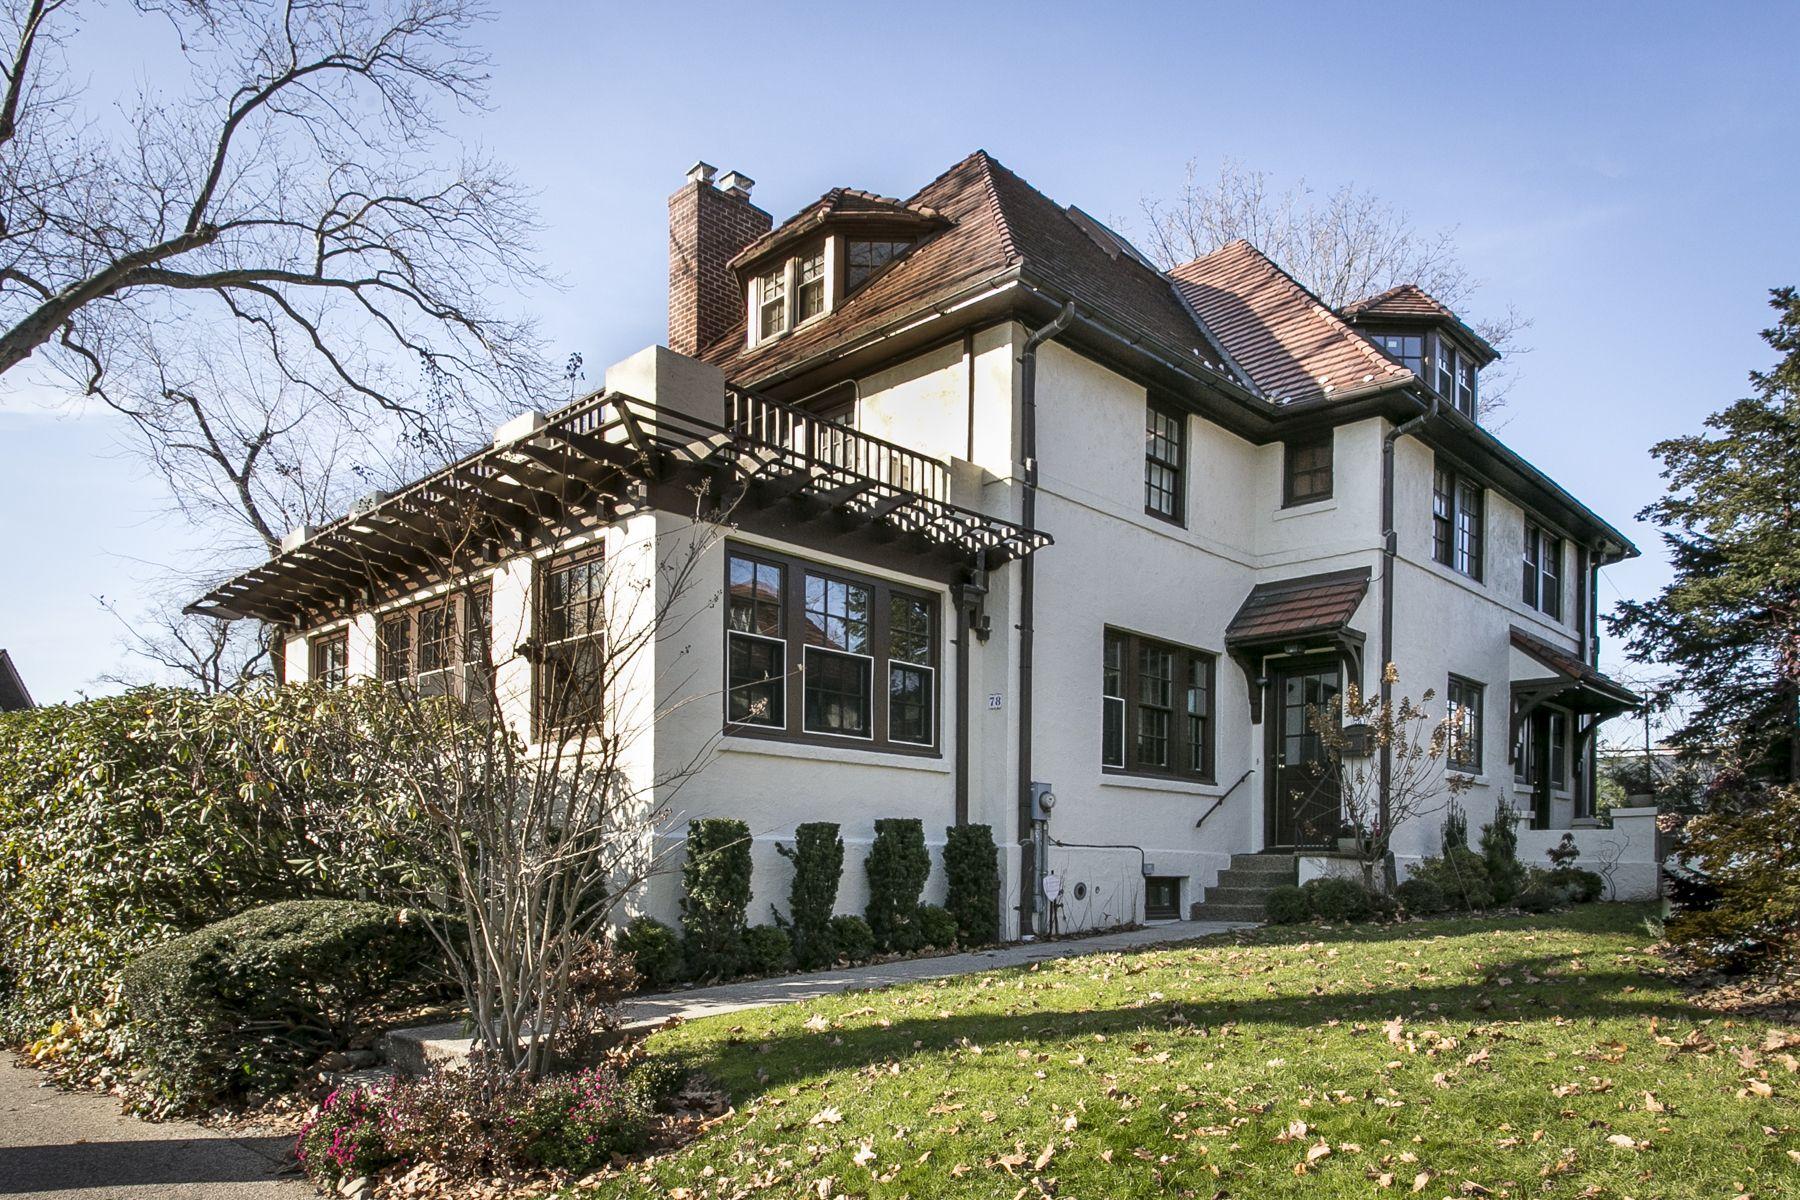 87362d56a1dcf114d54736f490670f76 - Forest Hills Gardens Real Estate Sotheby's